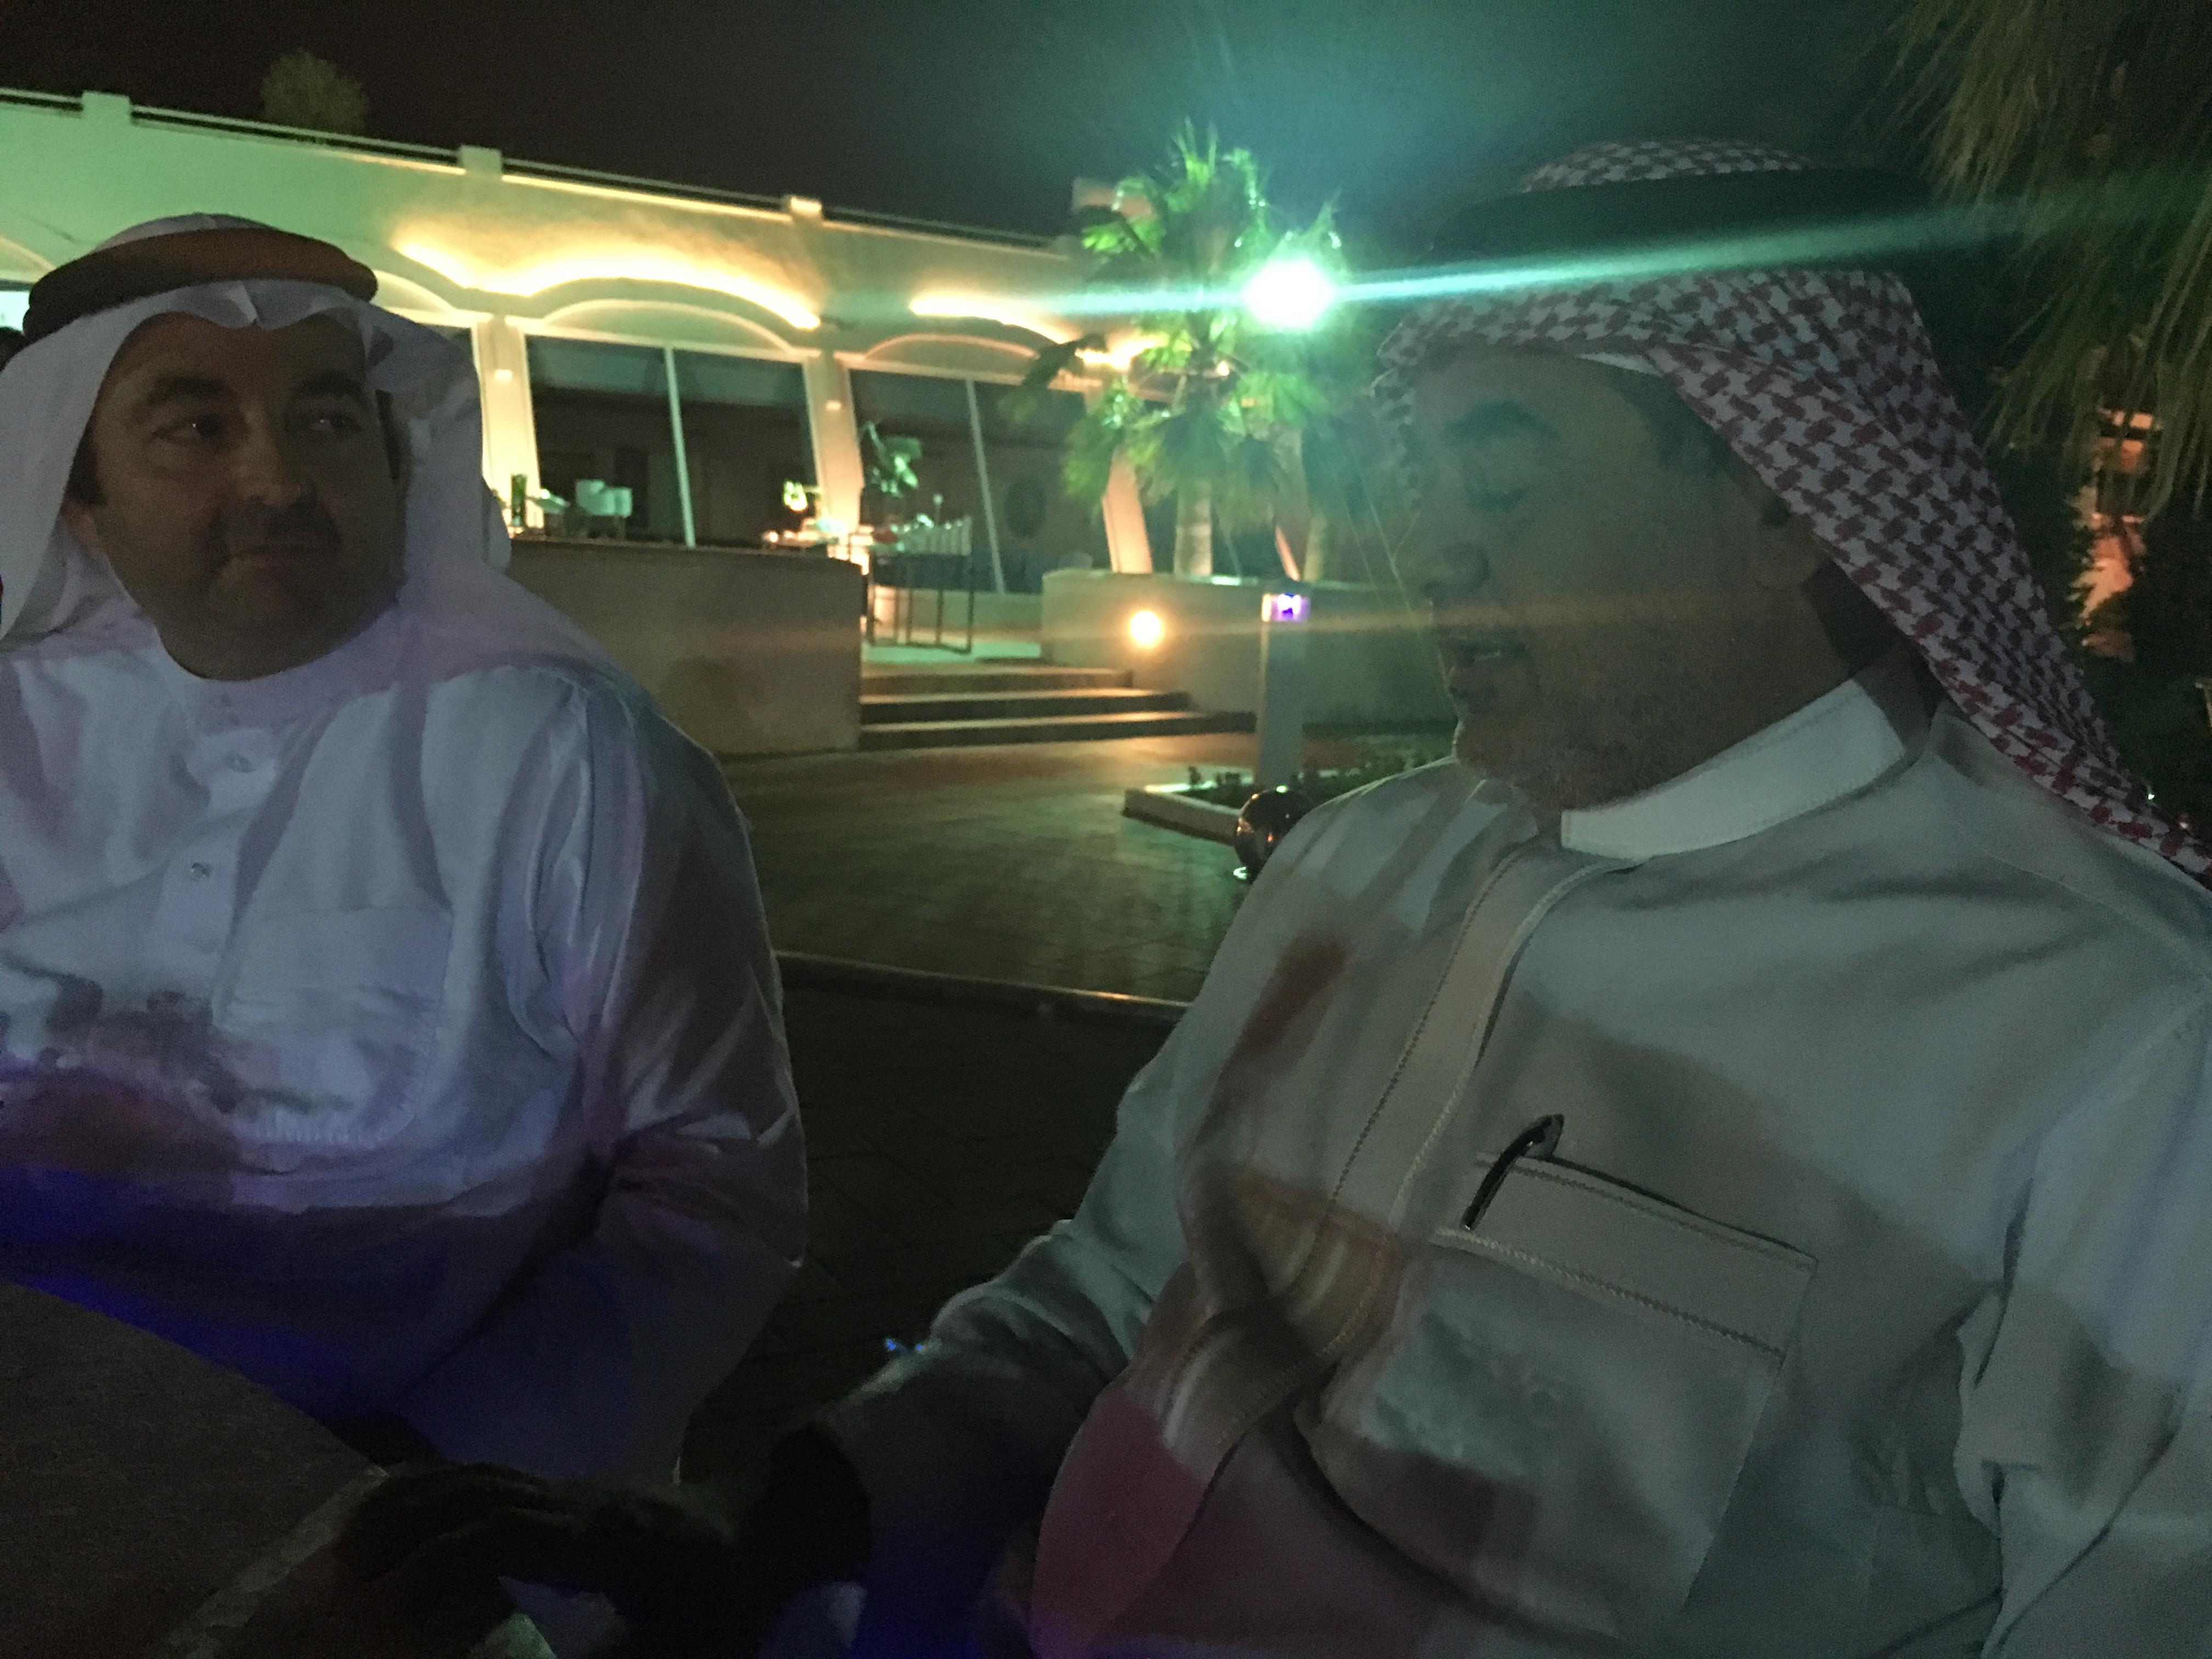 Dr. Ayubi updates of the event